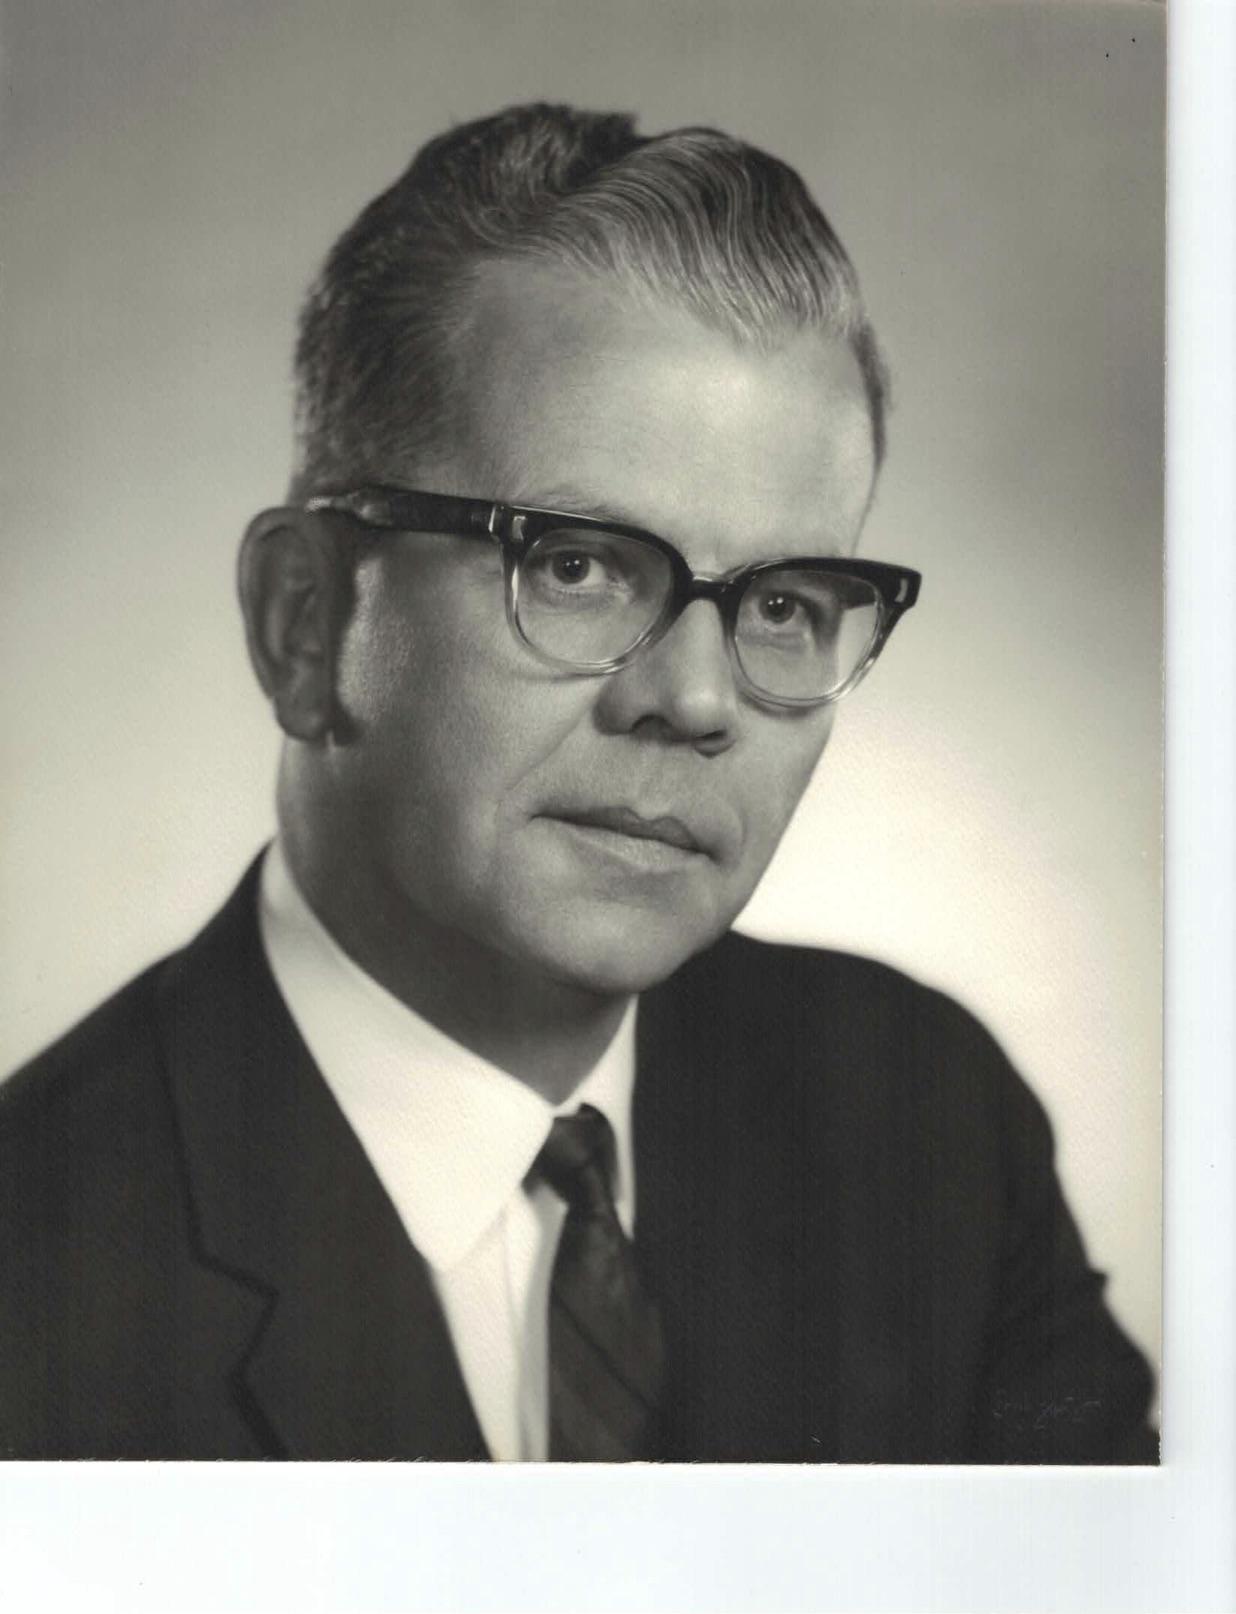 HENRY T. WOOD 1967-68